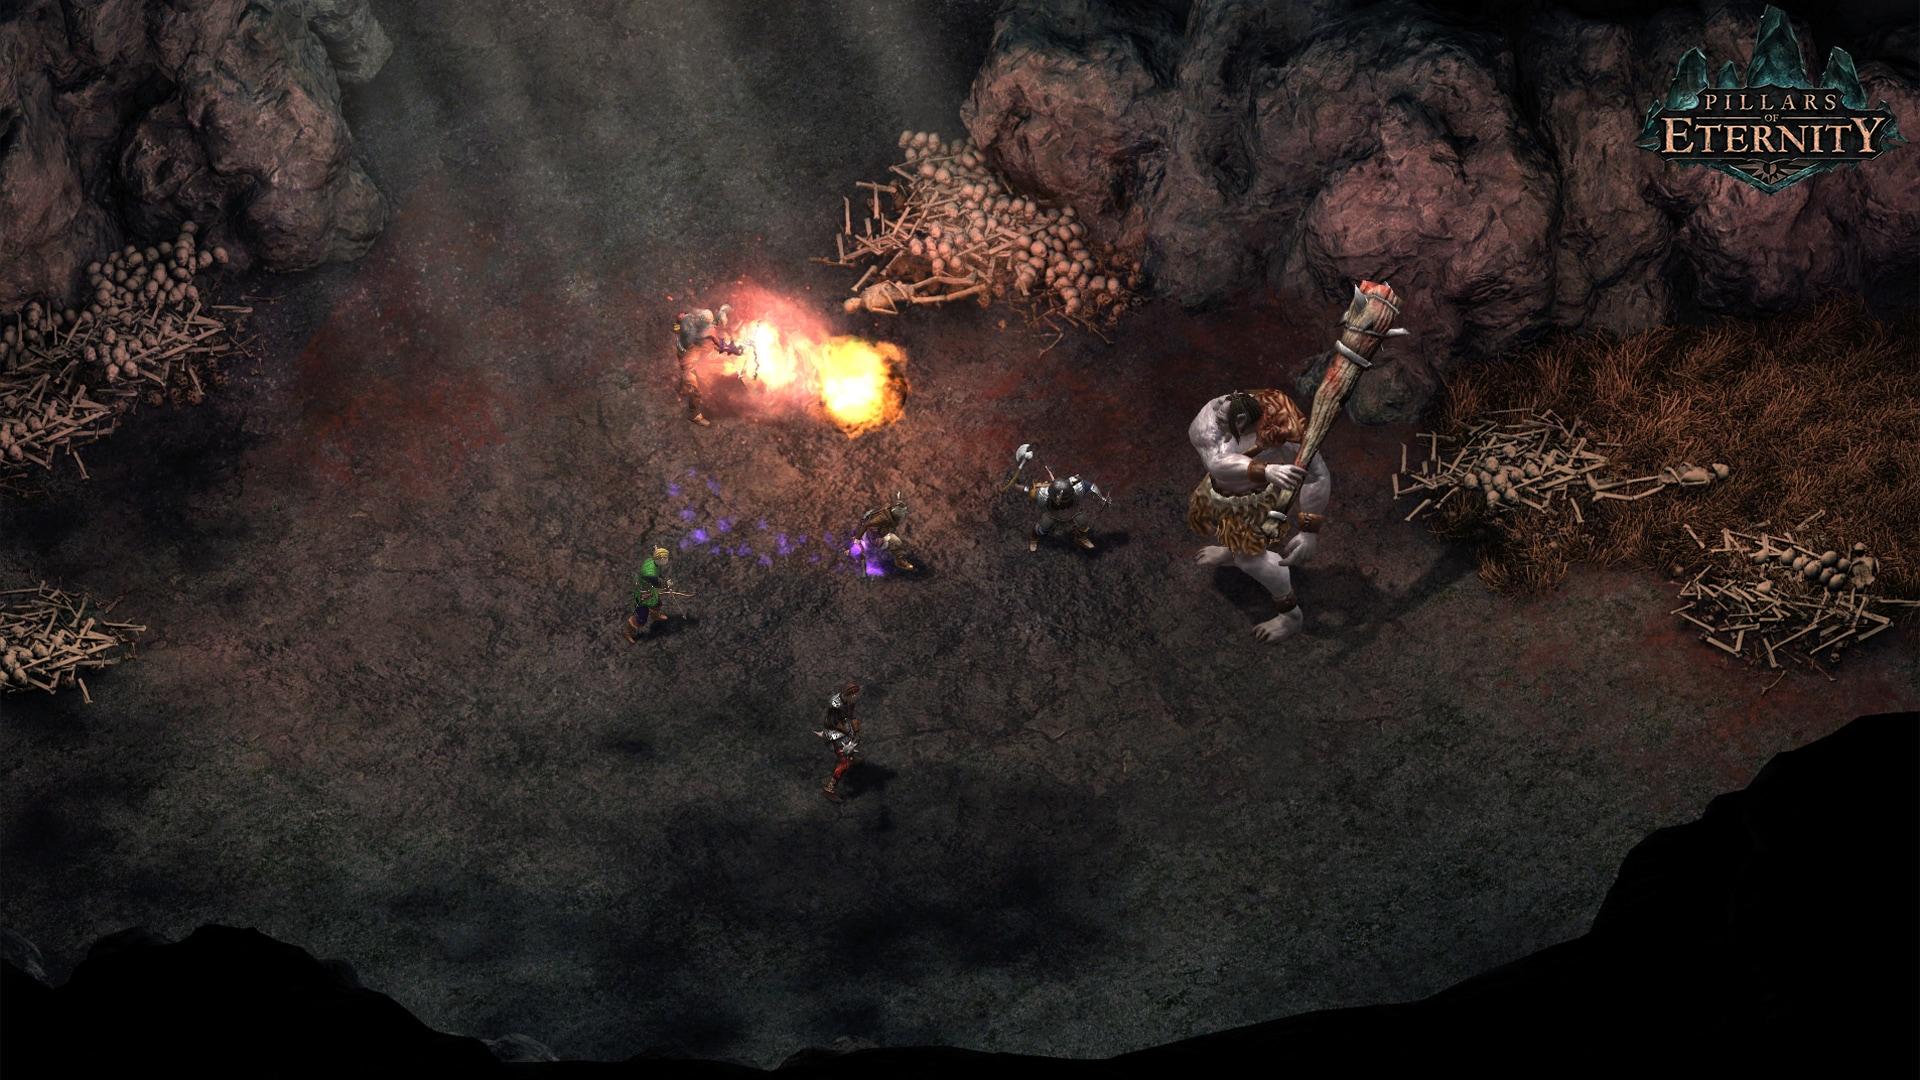 Pillars of Eternity - Hero Edition Steam Key GLOBAL - 4